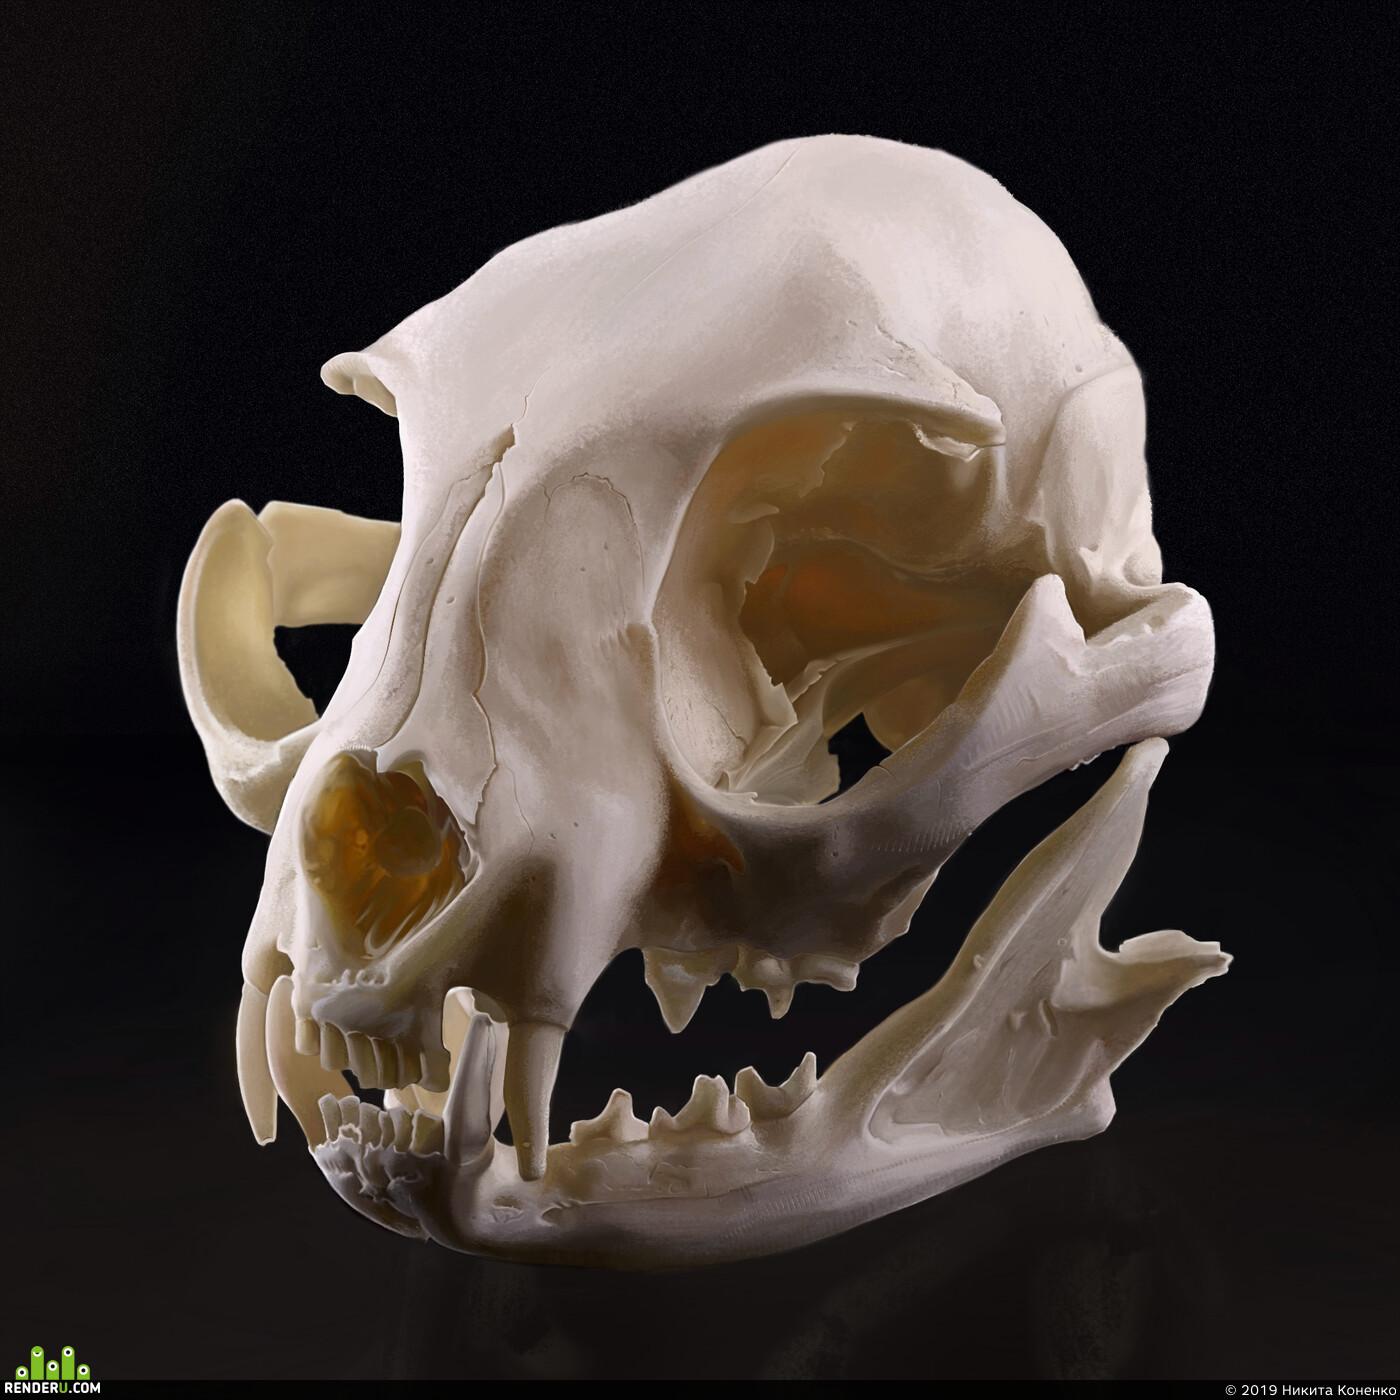 skull, Photoshop, art, 2dart